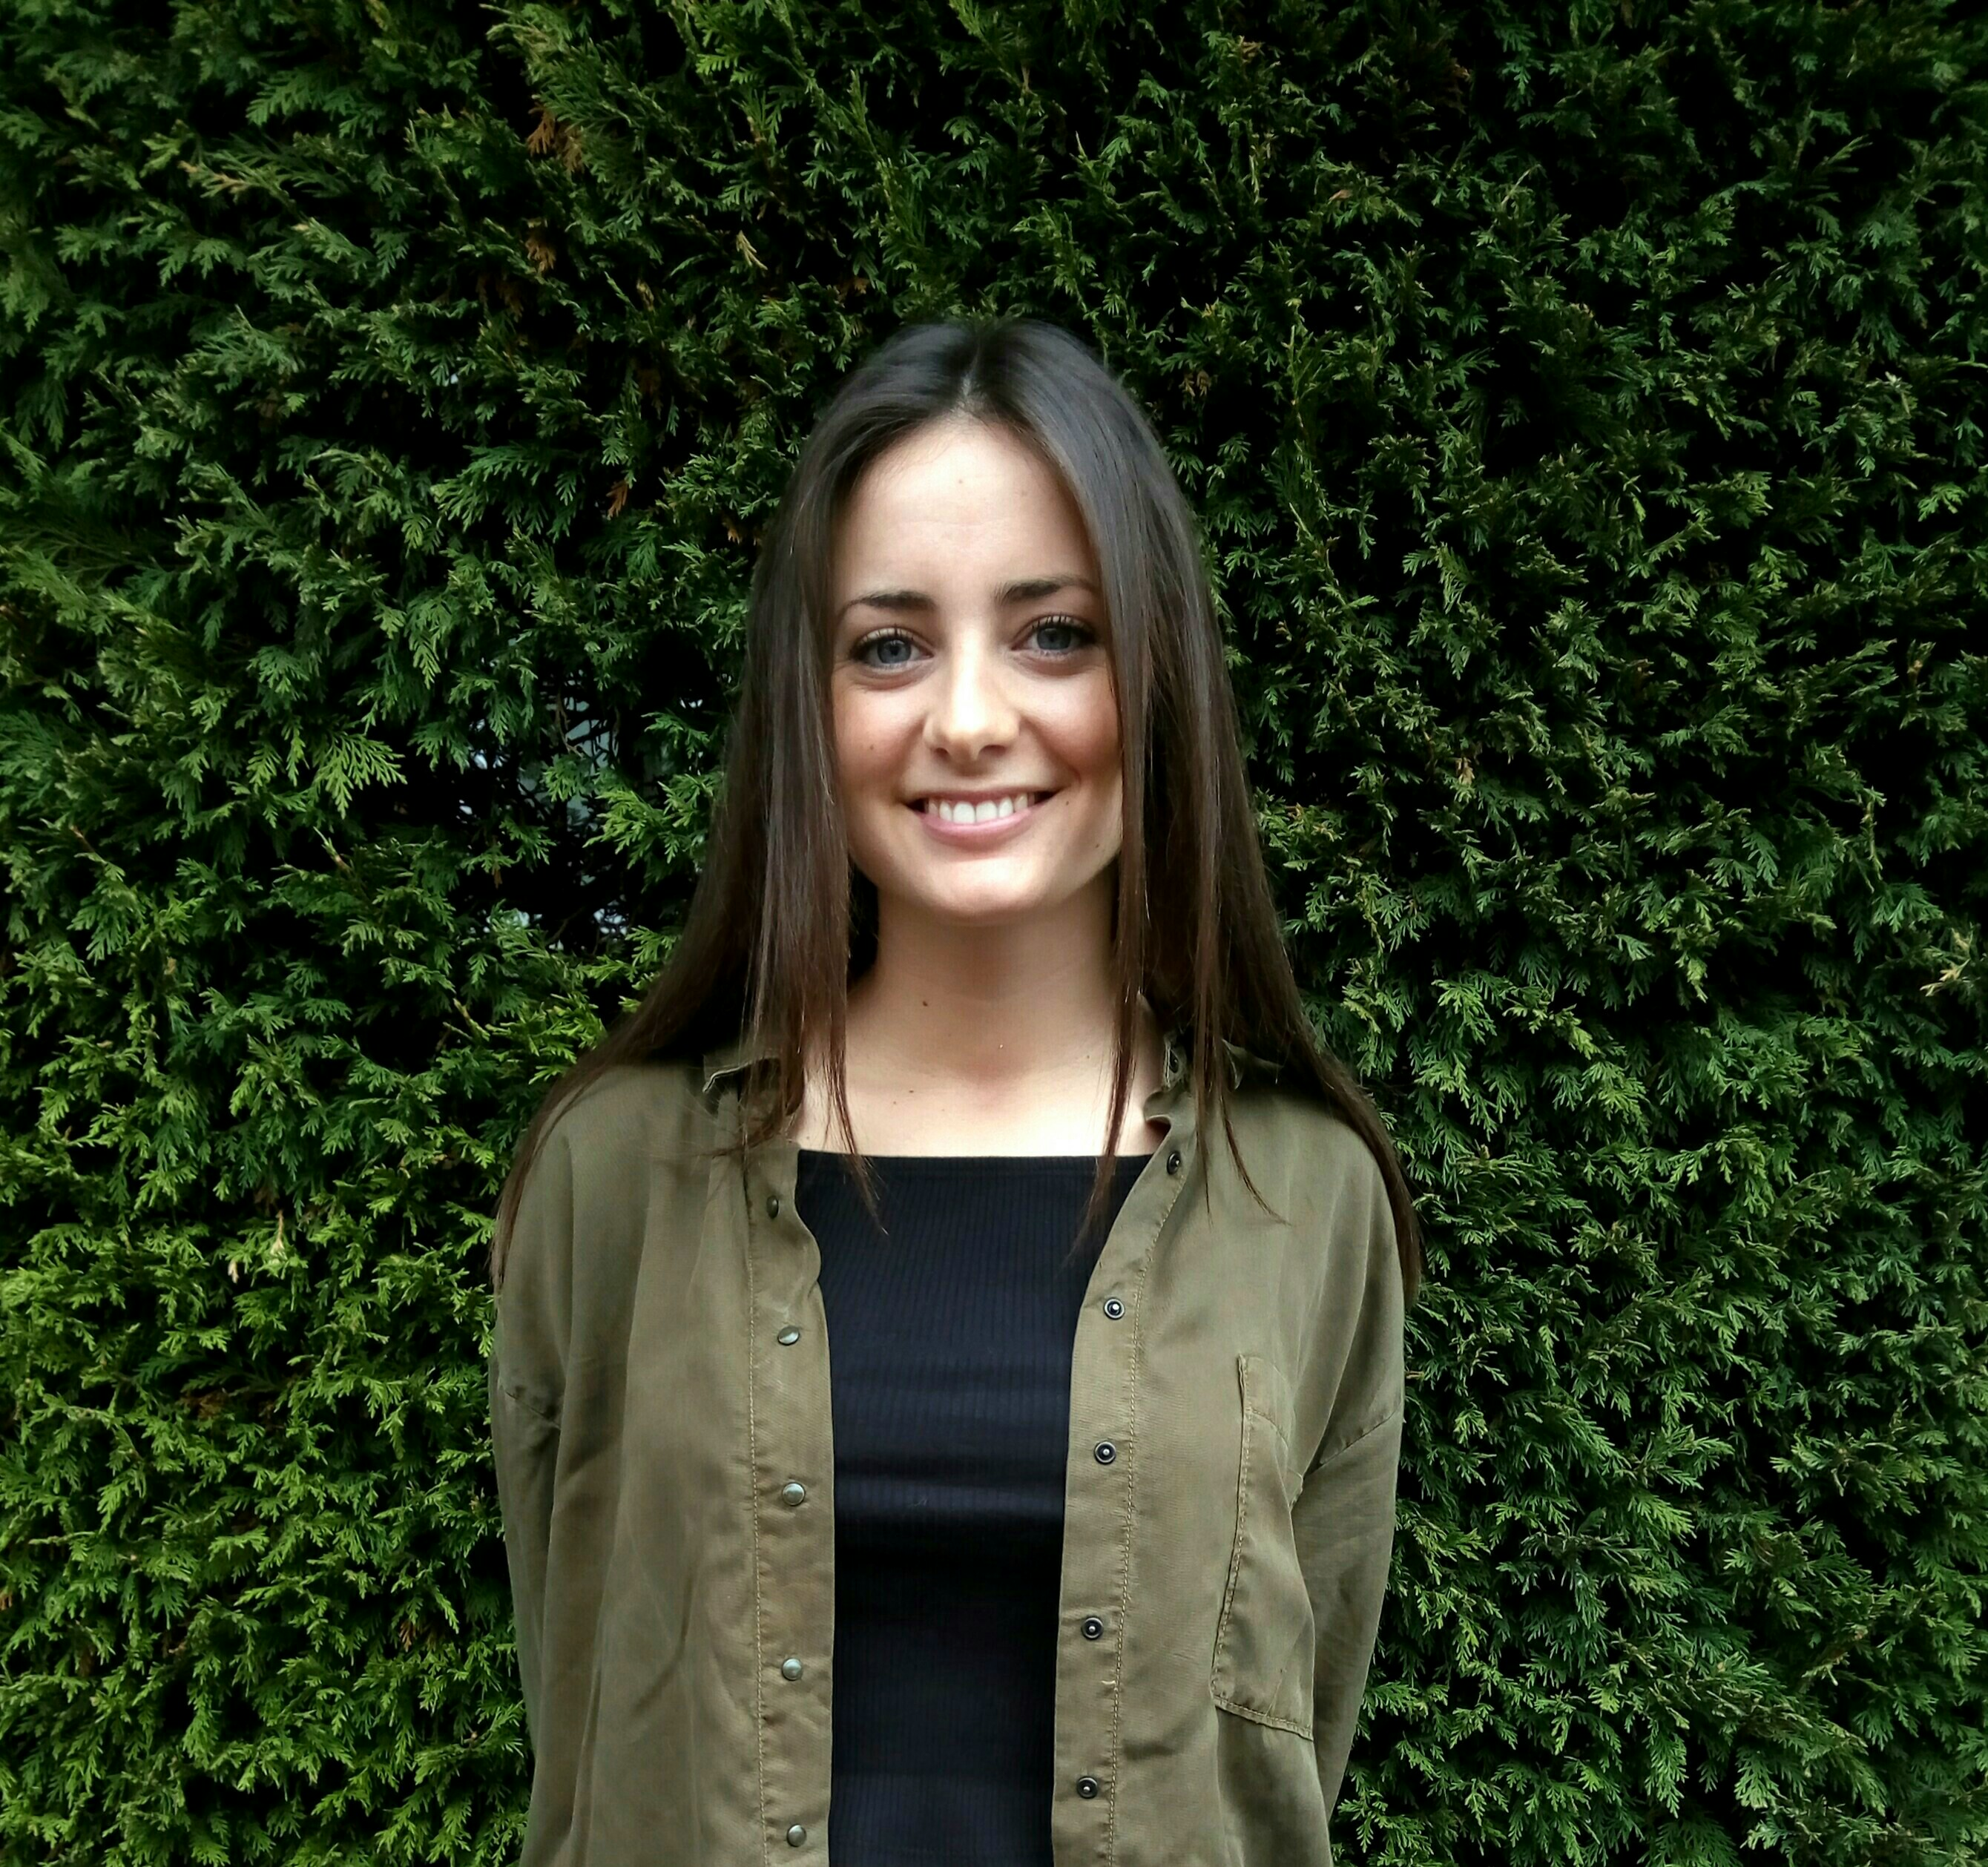 Lucía Castano